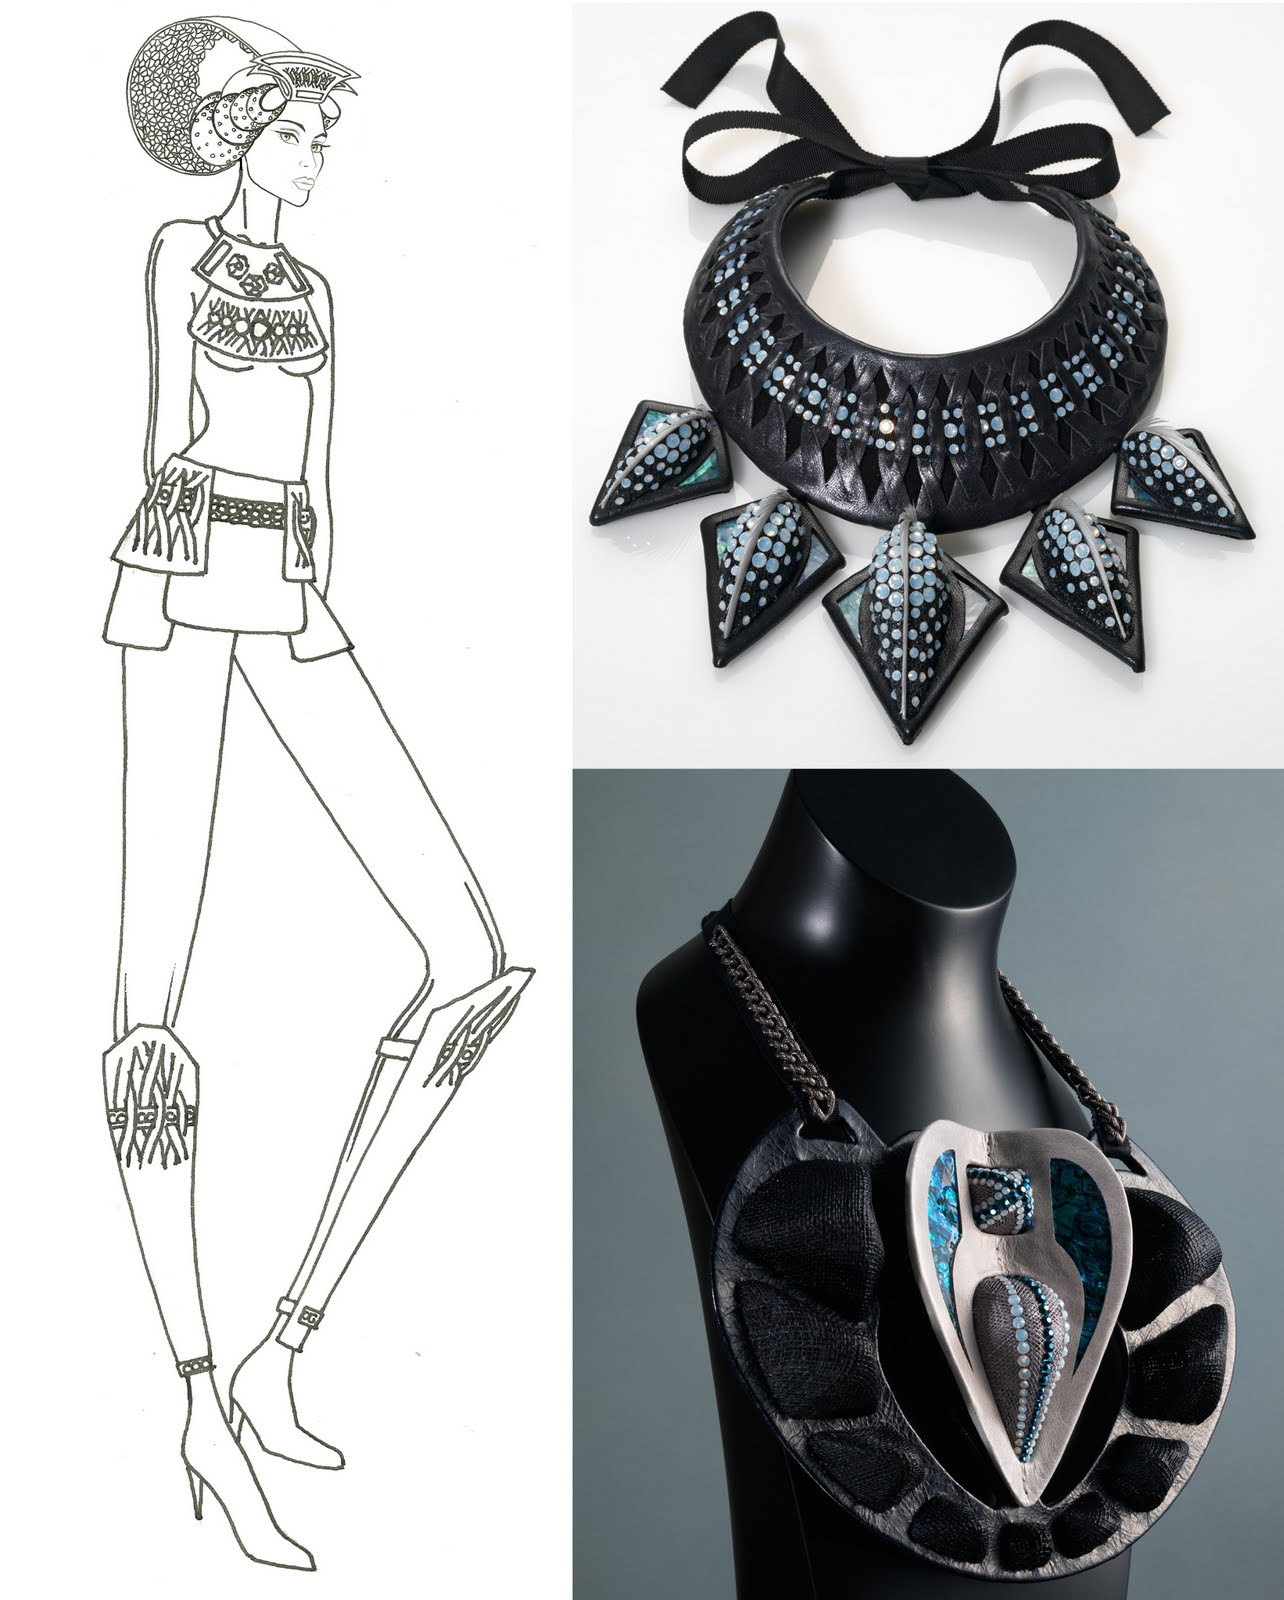 http://1.bp.blogspot.com/_4vumFXKaH7A/THcIB6UEvWI/AAAAAAAACds/LZx9Uq3W9n4/s1600/Carianne+Moore+Swarovski+Crystal+Fashion+Film+Outfit+Sketch.jpg